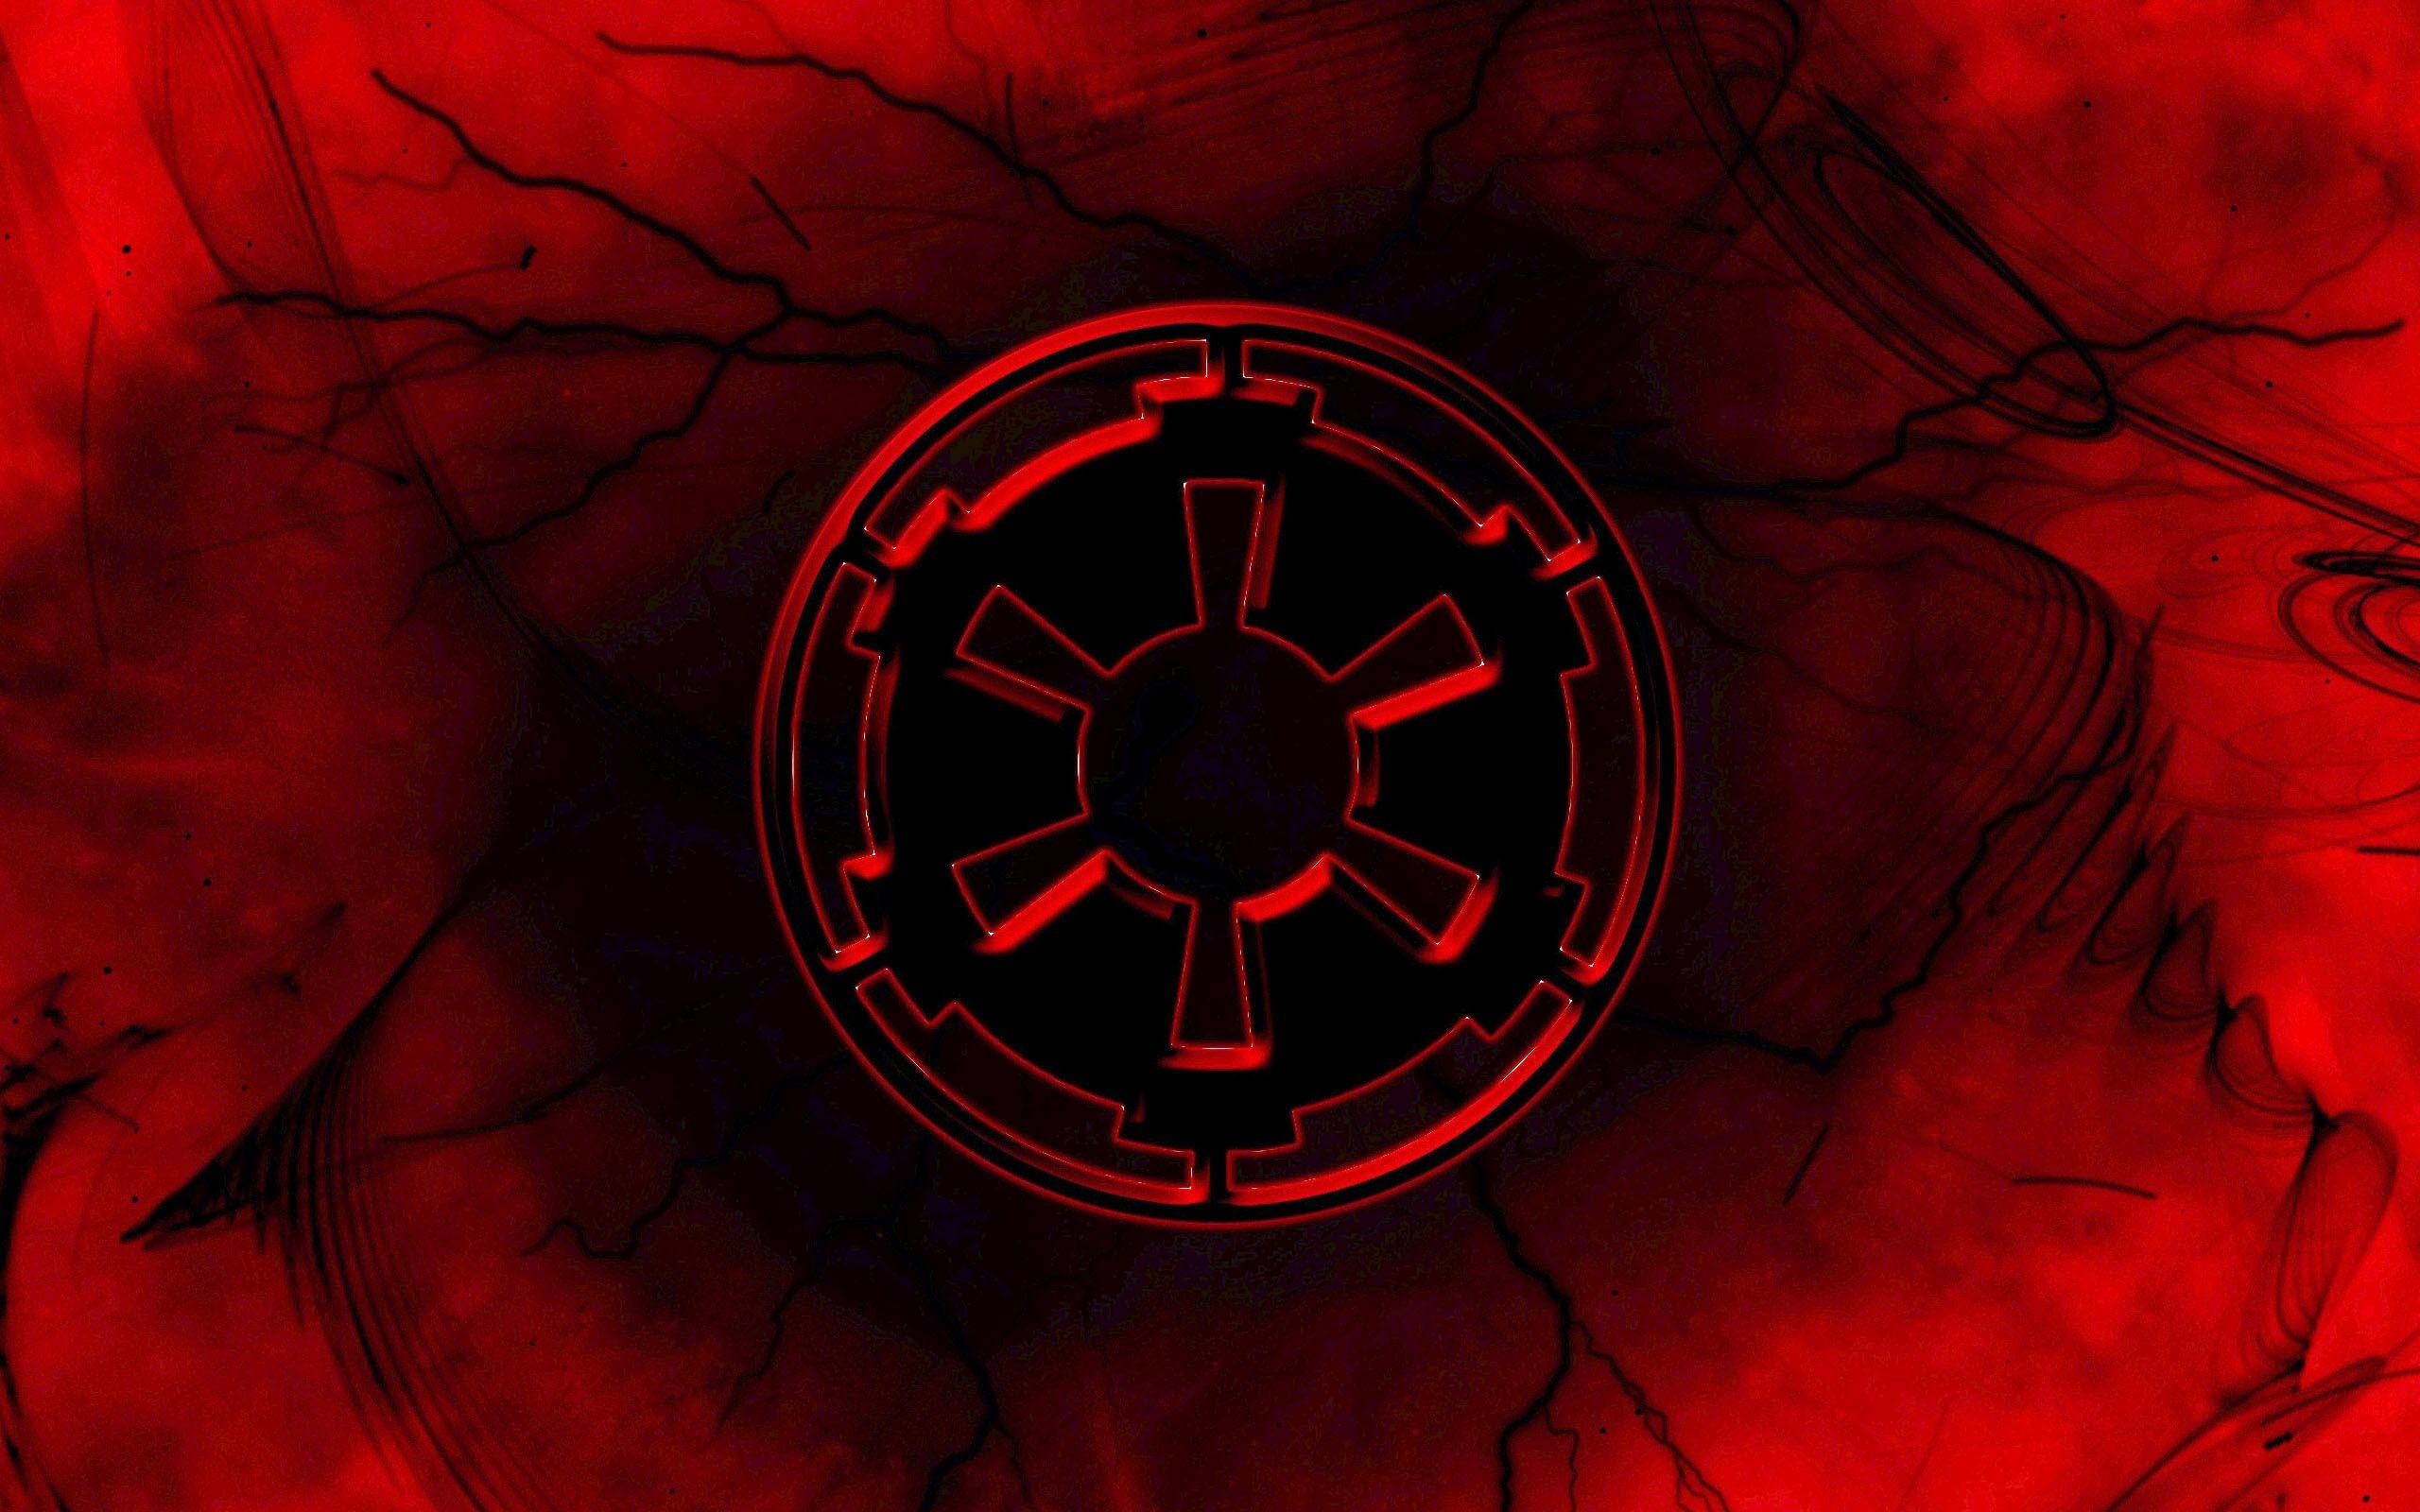 Star Wars Sith Wallpapers Desktop Background As Wallpaper HD